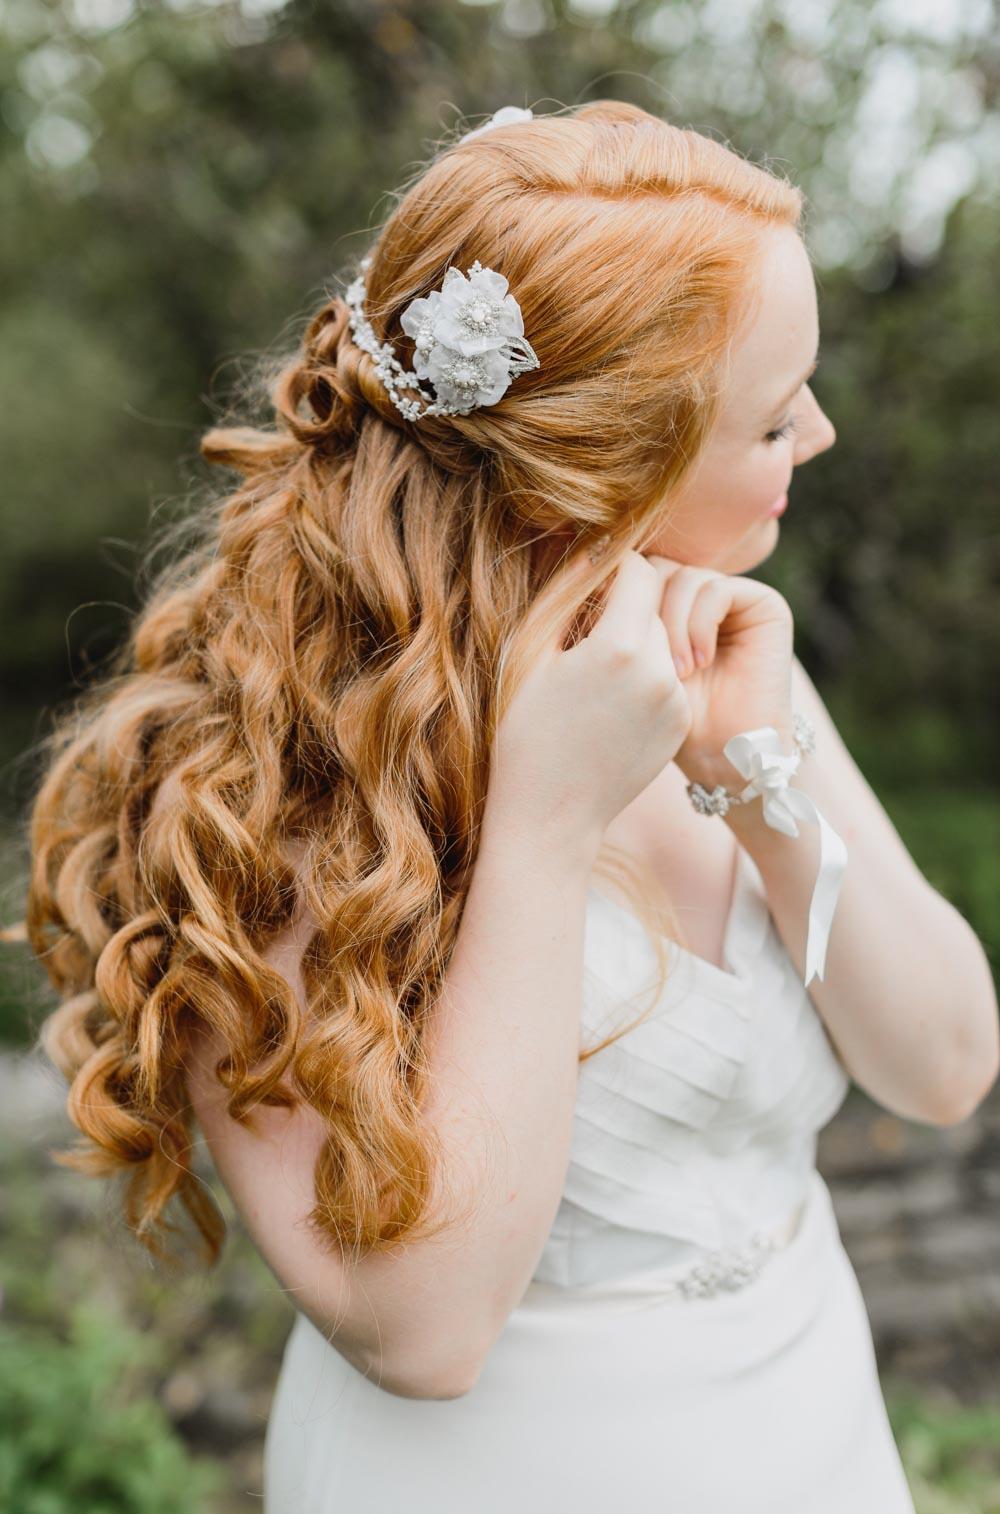 Myrtle Hair Chain, Gardenia Bracelet, & Orange Blossom Belt